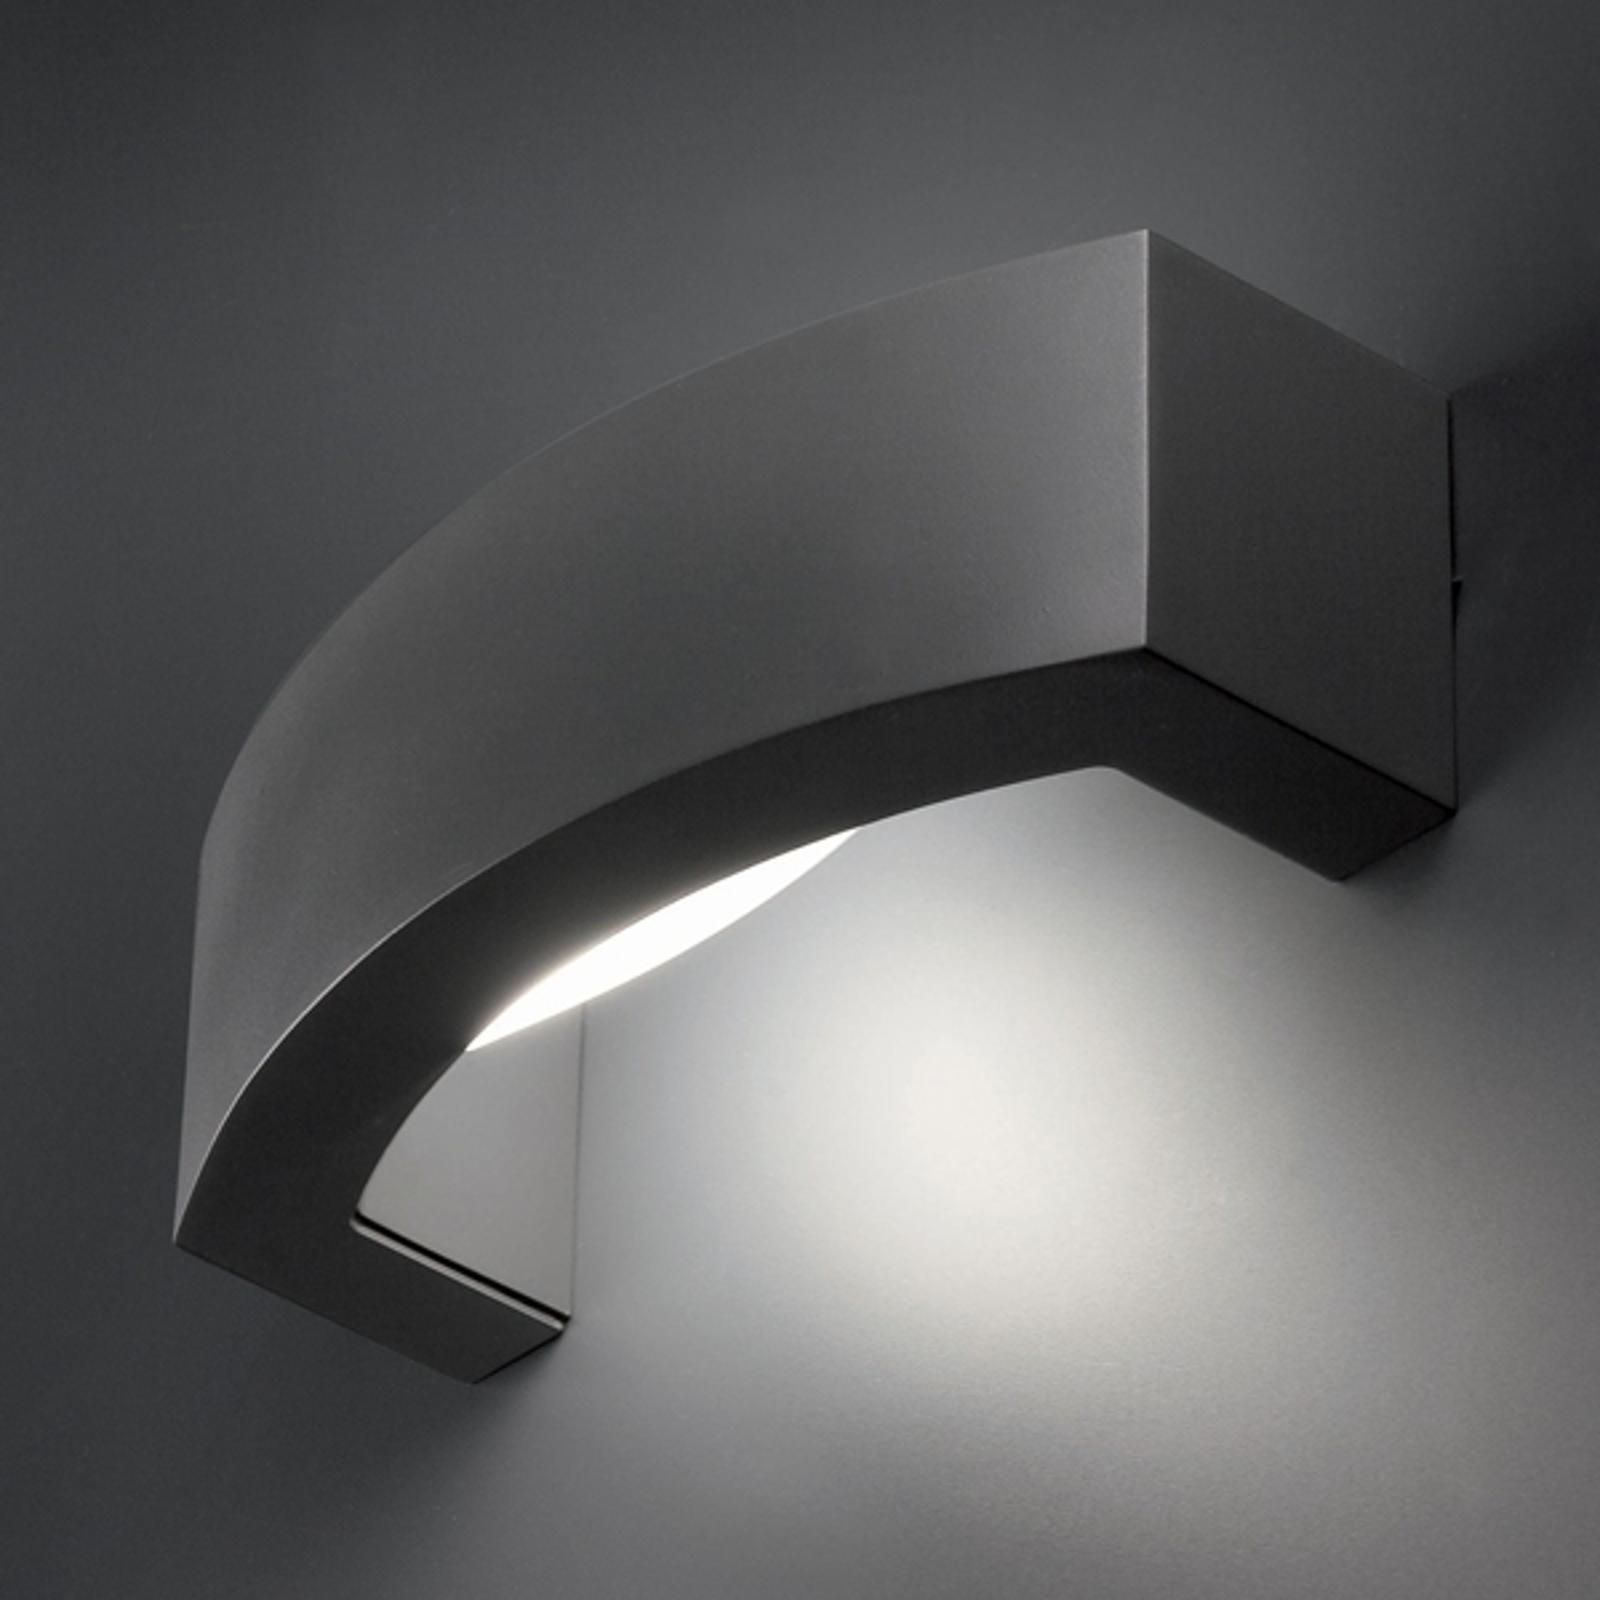 Ancora Attractive Exterior Wall Lamp_3505082_1